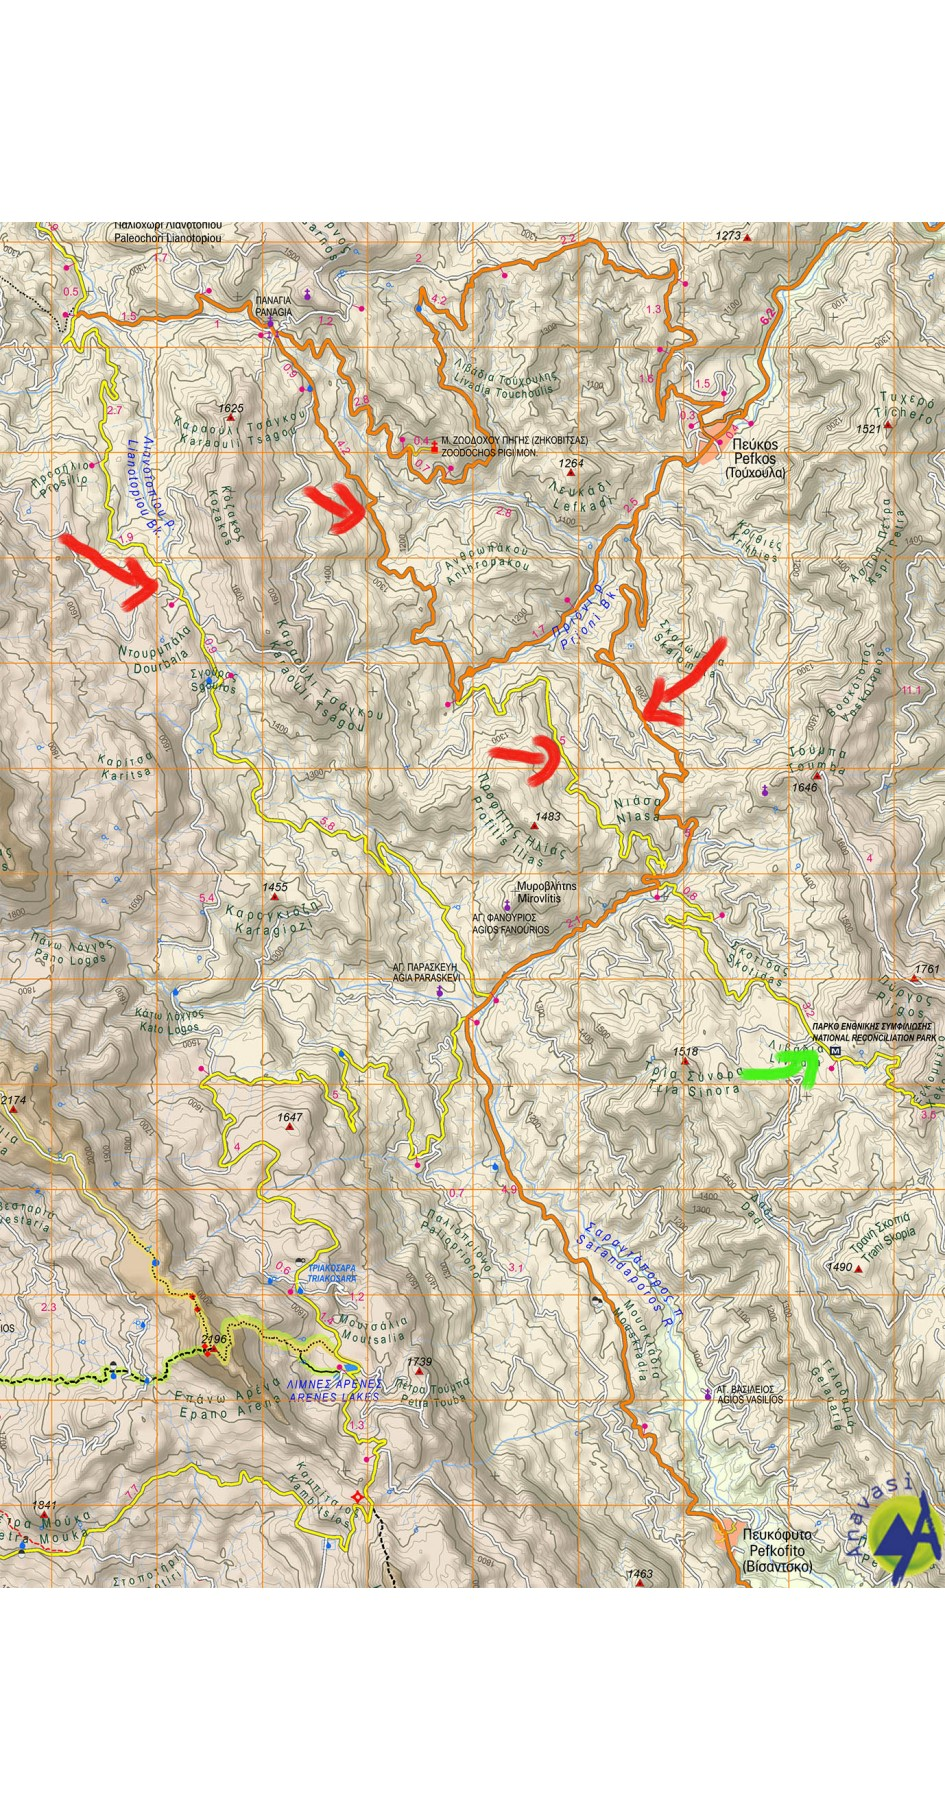 Gramos, Smolikas, Voio, Vasilitsa • Hiking map 1:40000